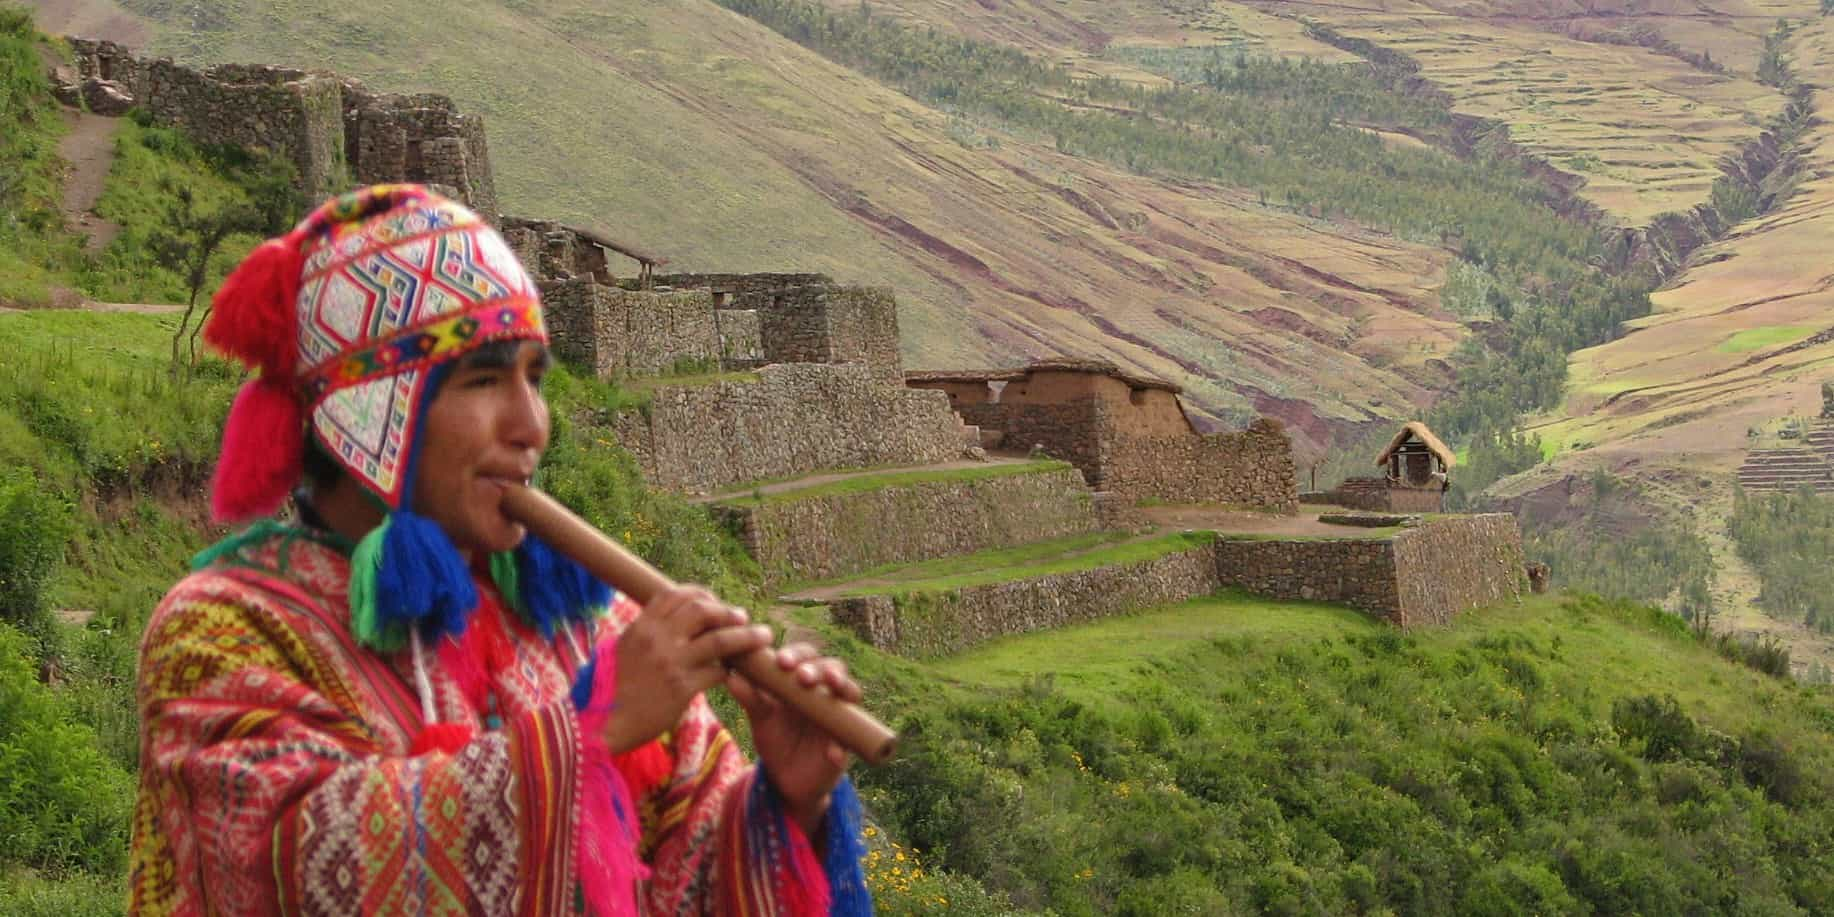 De bevolking van Peru